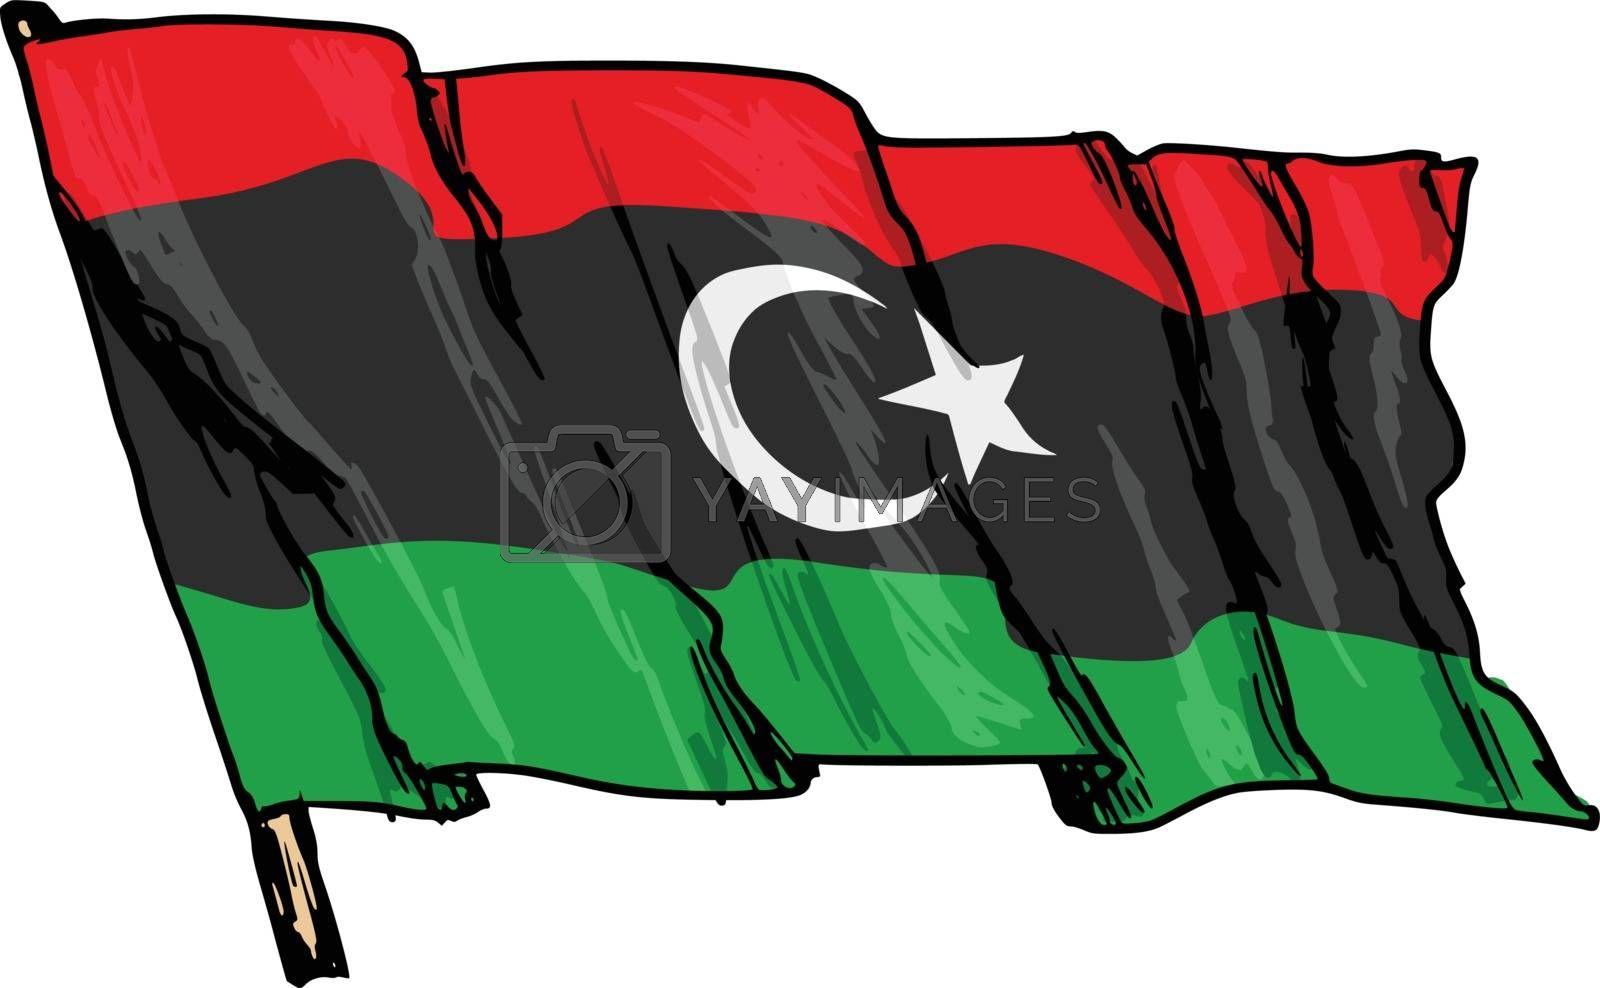 hand drawn, sketch, illustration of flag of Libya